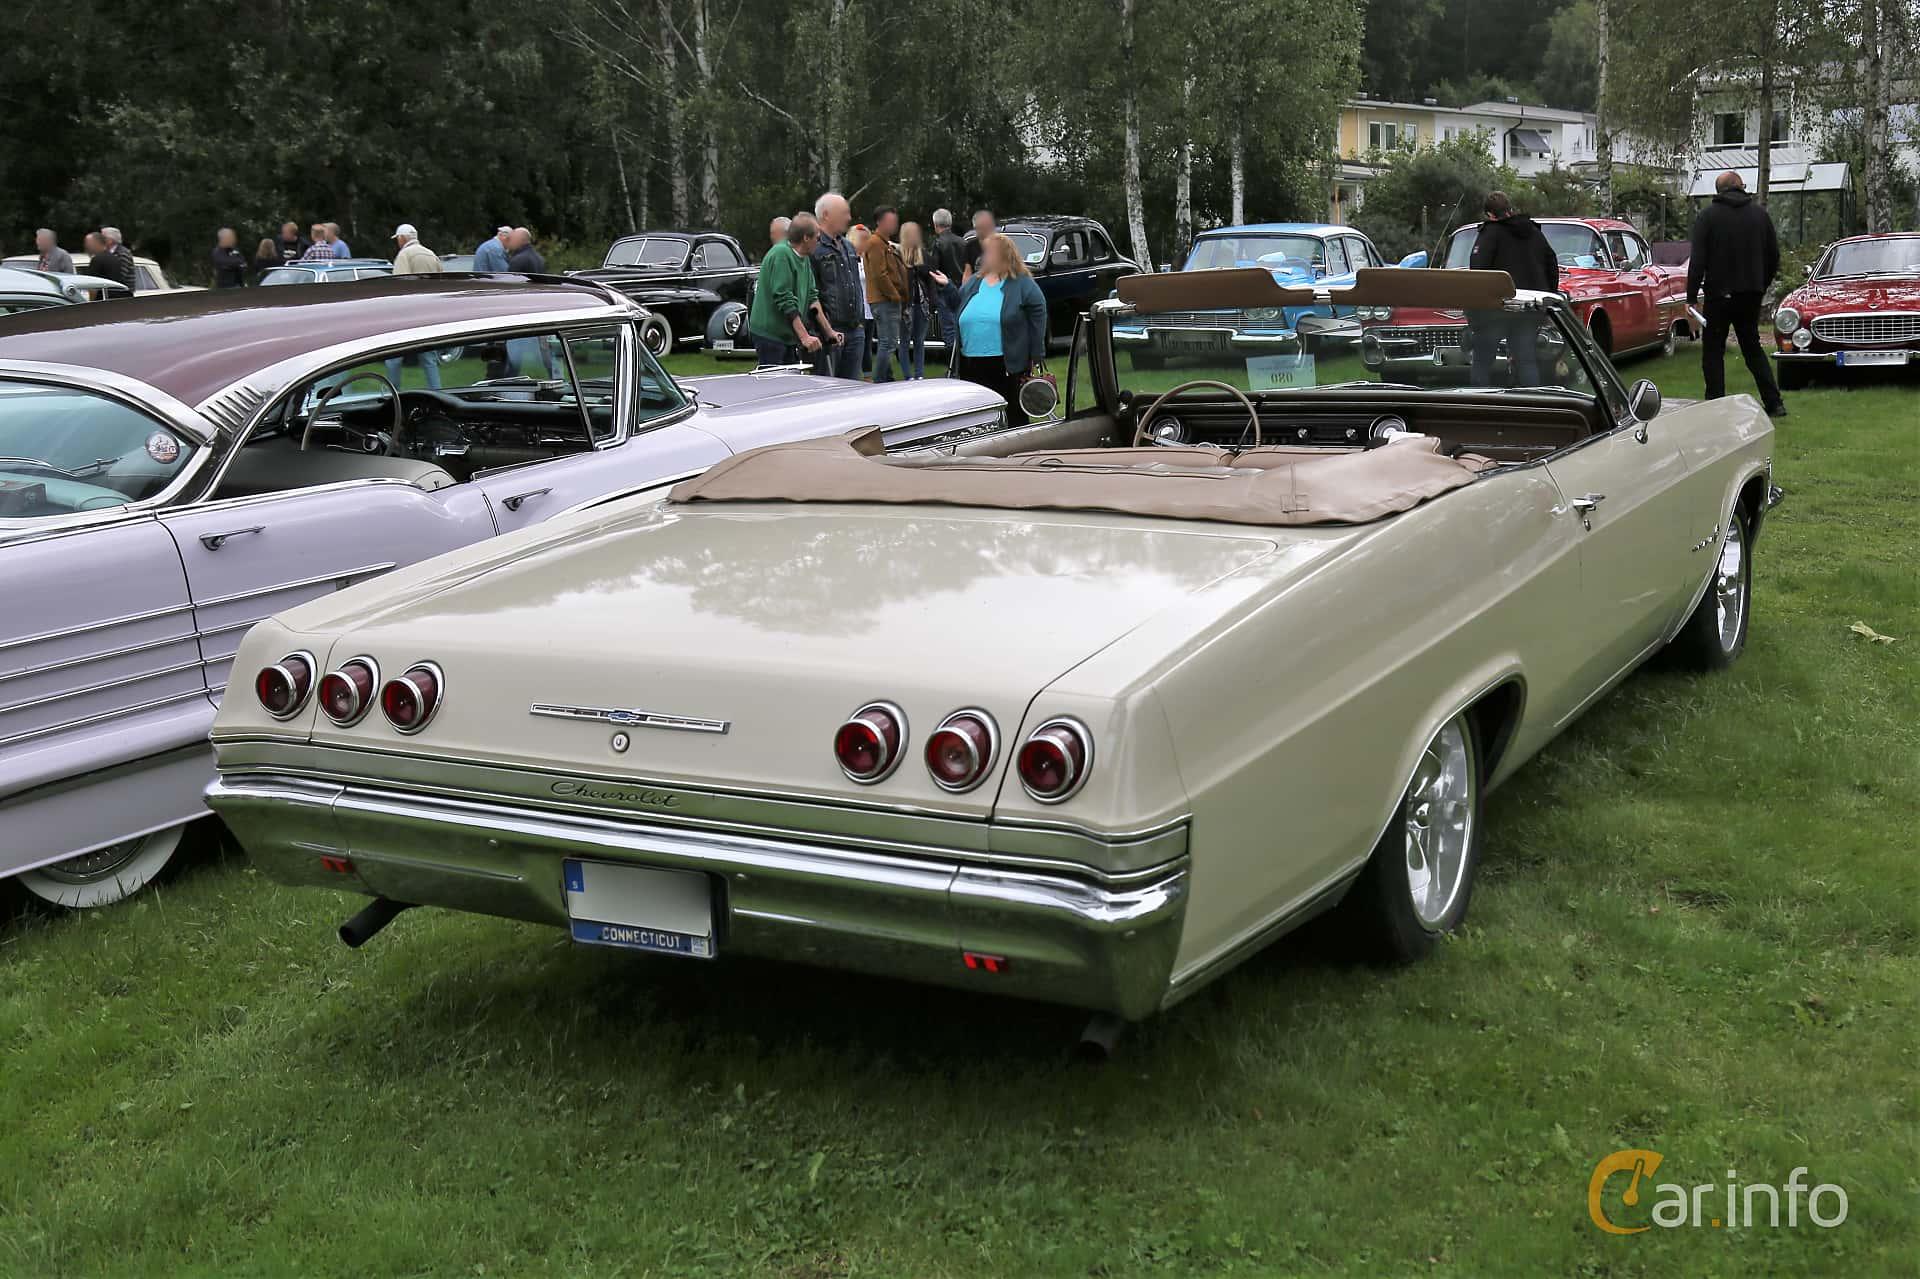 Chevrolet Impala Convertible 4.6 V8 Powerglide, 198hp, 1965 at Lödöse motornostalgiska dag 2019